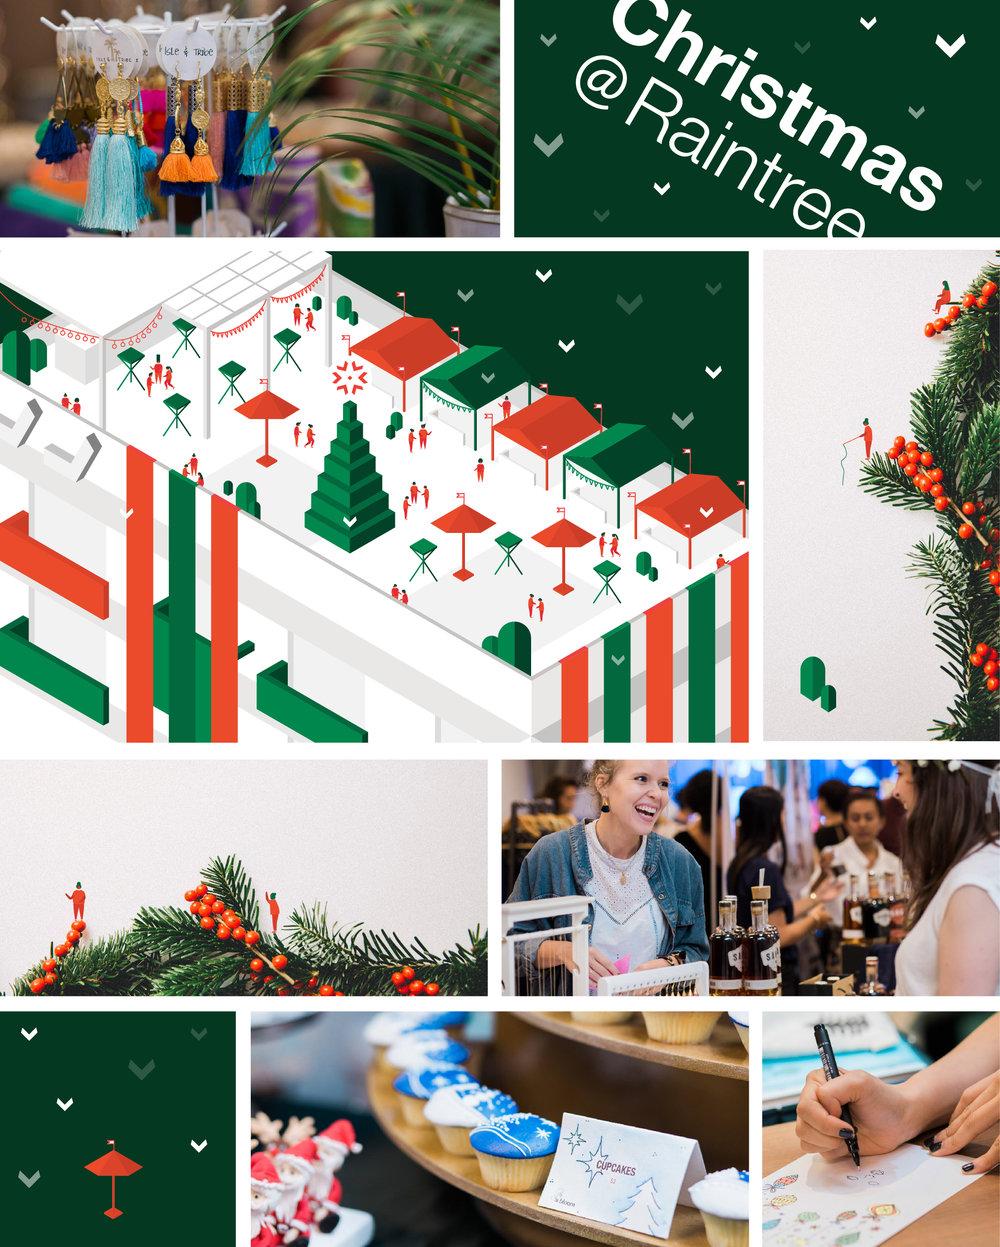 RAINTREE-Christmas-CollageFINAL-02.jpg